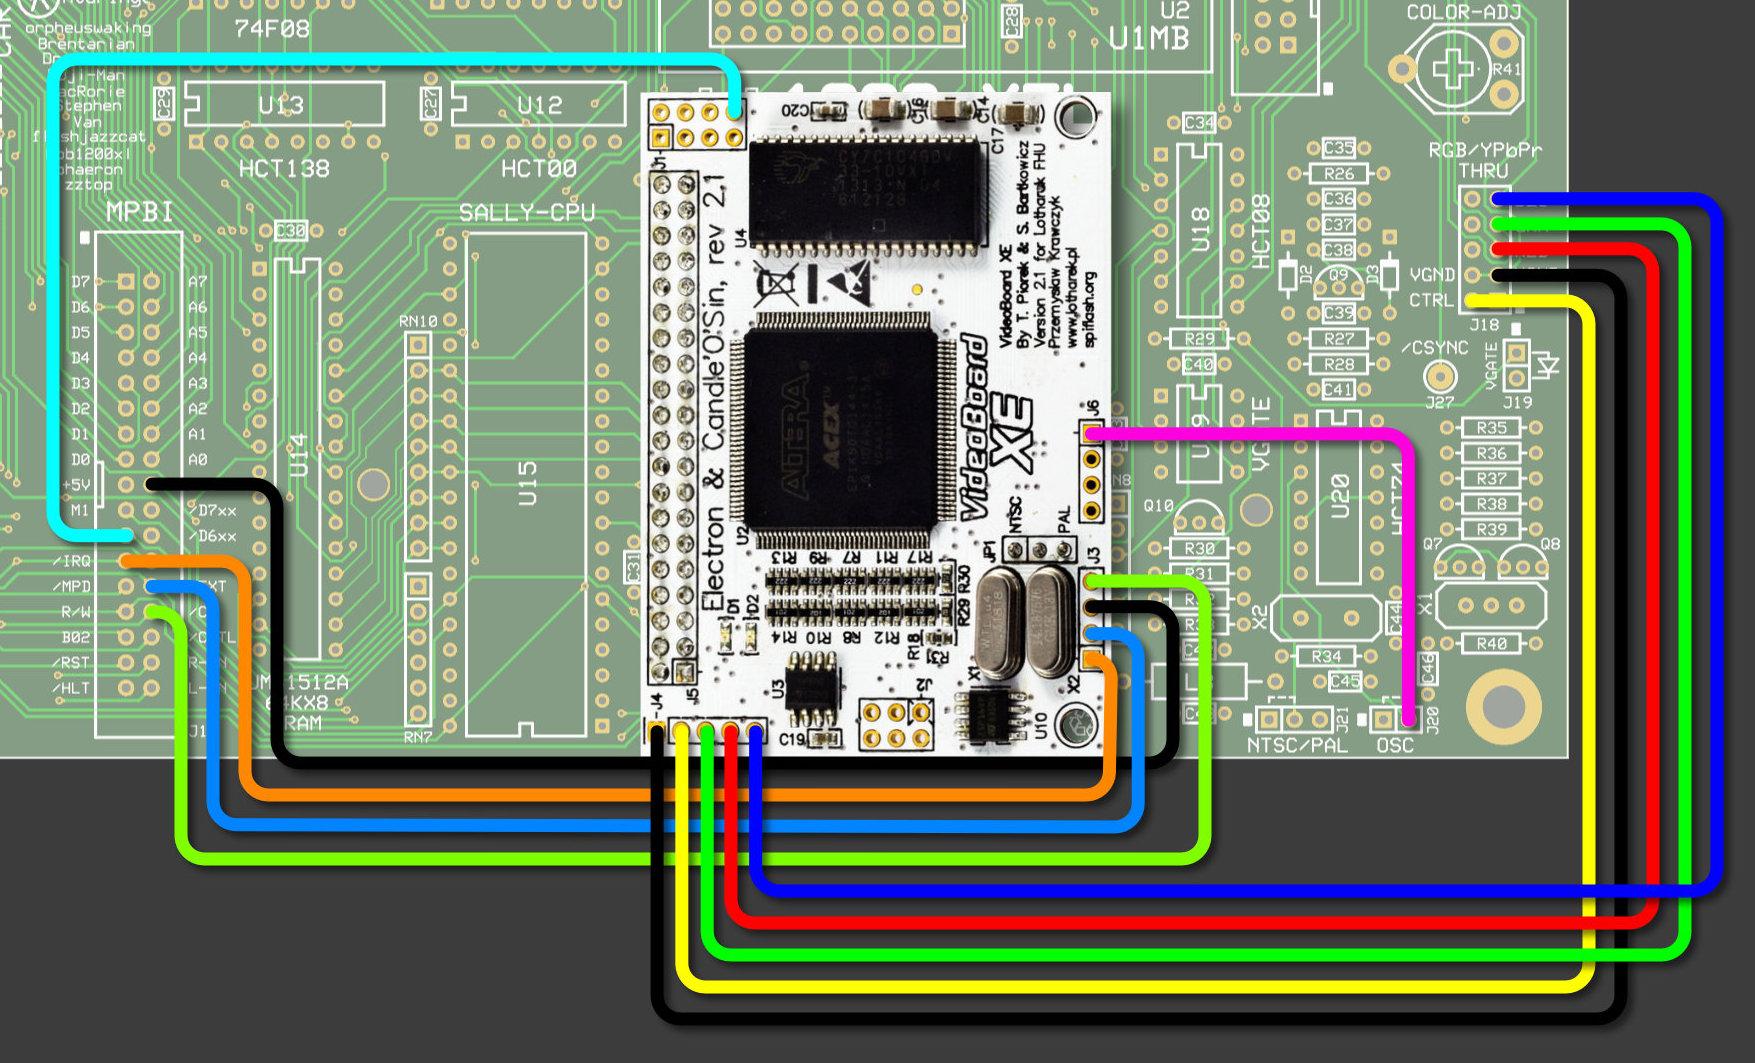 Vbxe  U2013 1088xel Wiring Diagram  U2013 Atari 8bit